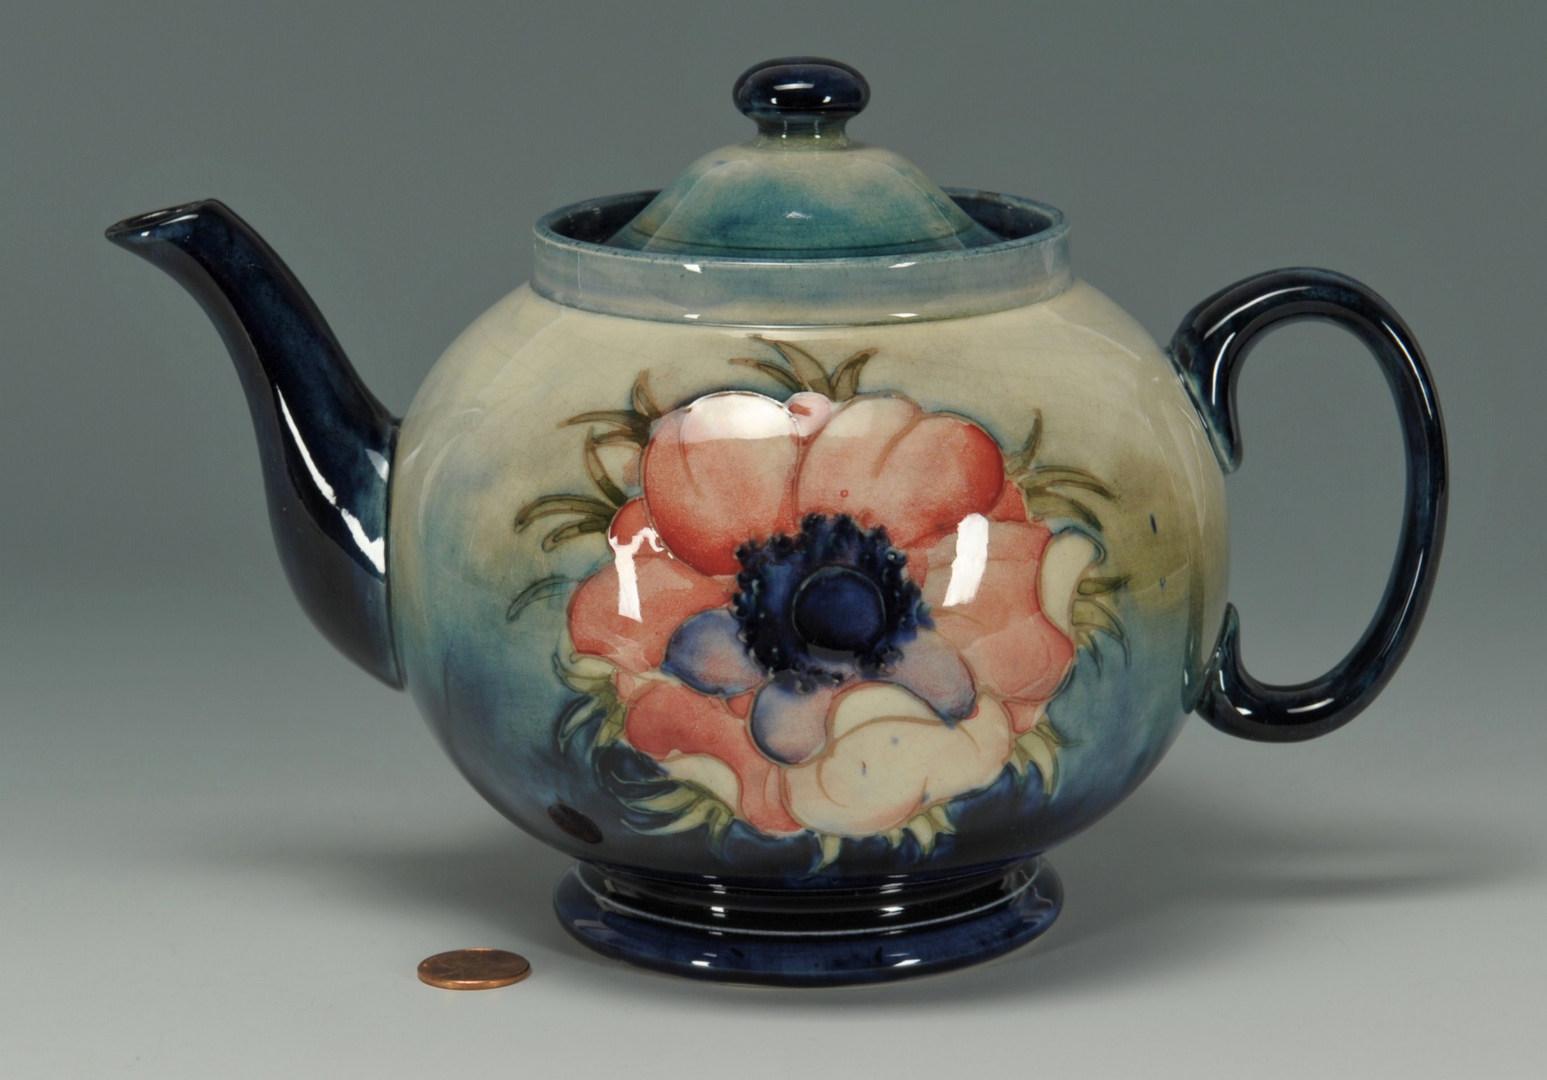 Lot 282: Moorcroft Anemone Teapot